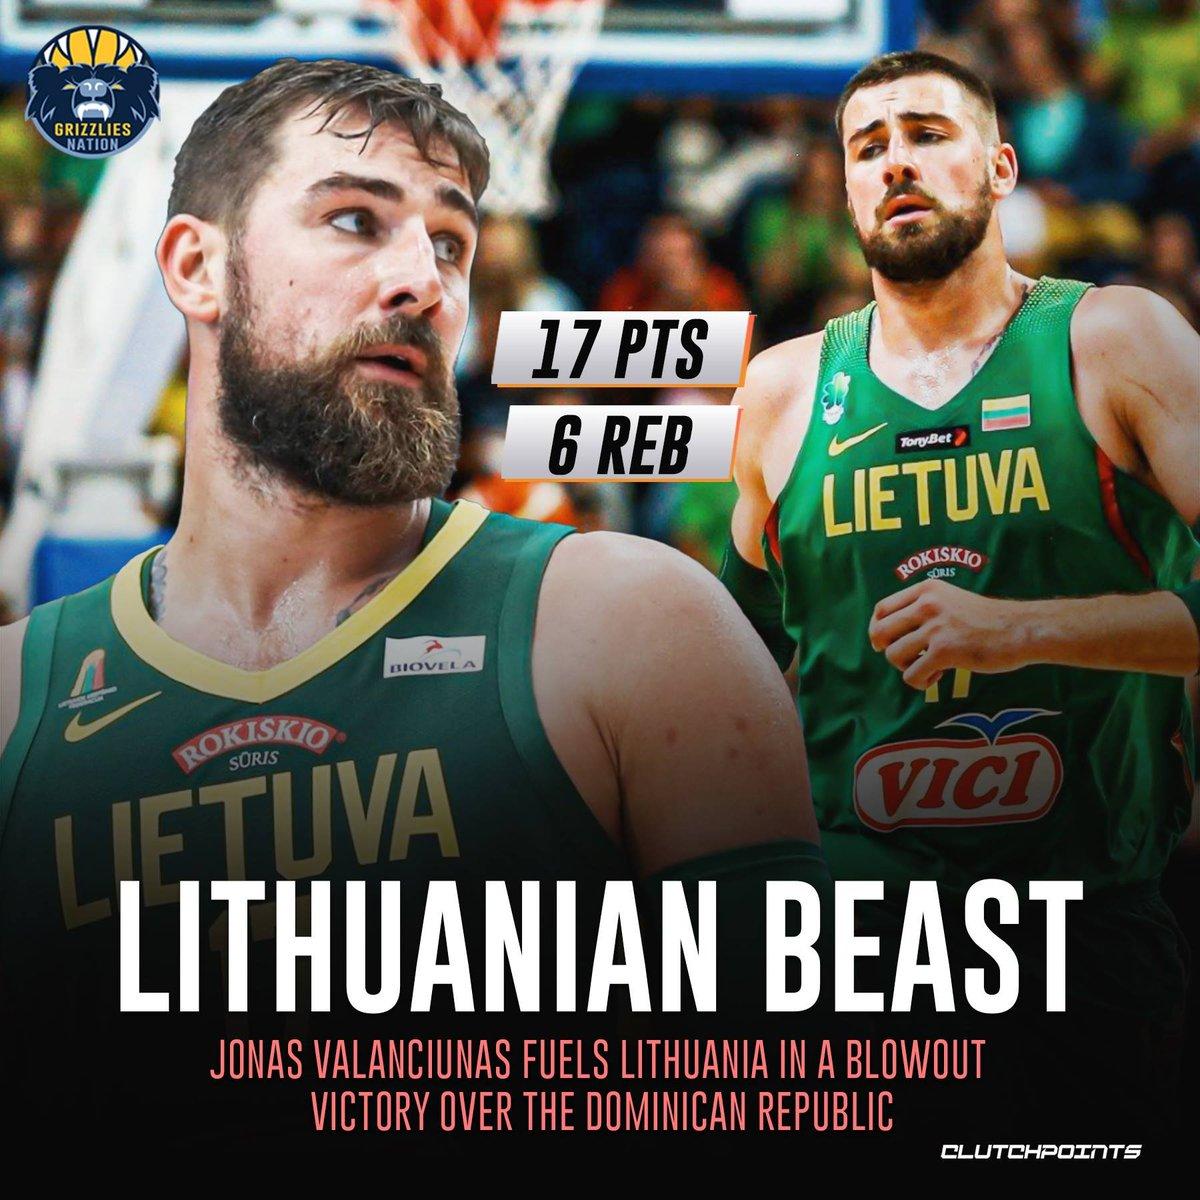 Jonas Valanciunas led all scorers as Lithuania cruised past the Dominican Republic. 💪 https://t.co/O5J9UiU7SO